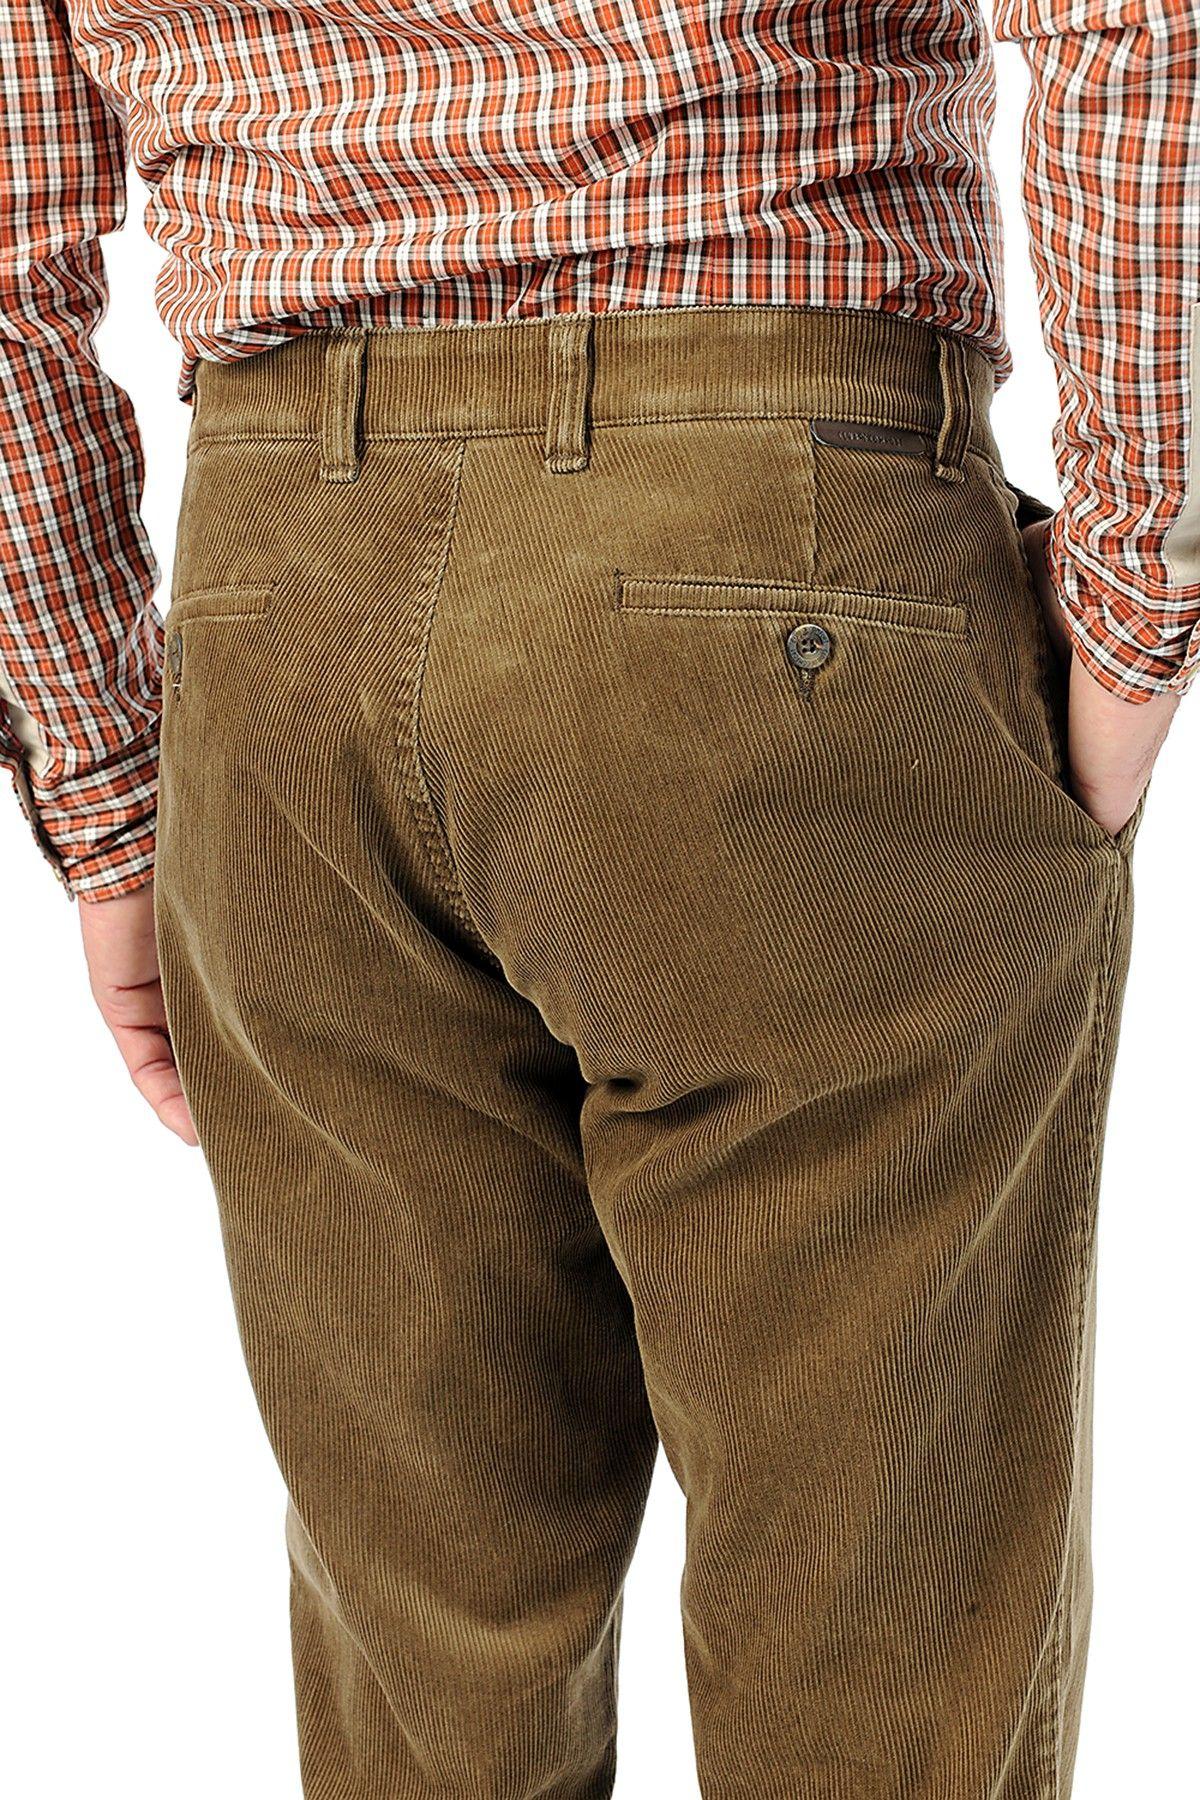 Club of Comfort - Herren Stretchcord Hose in verschiedenen Farben, Derry (5810) – Bild 7